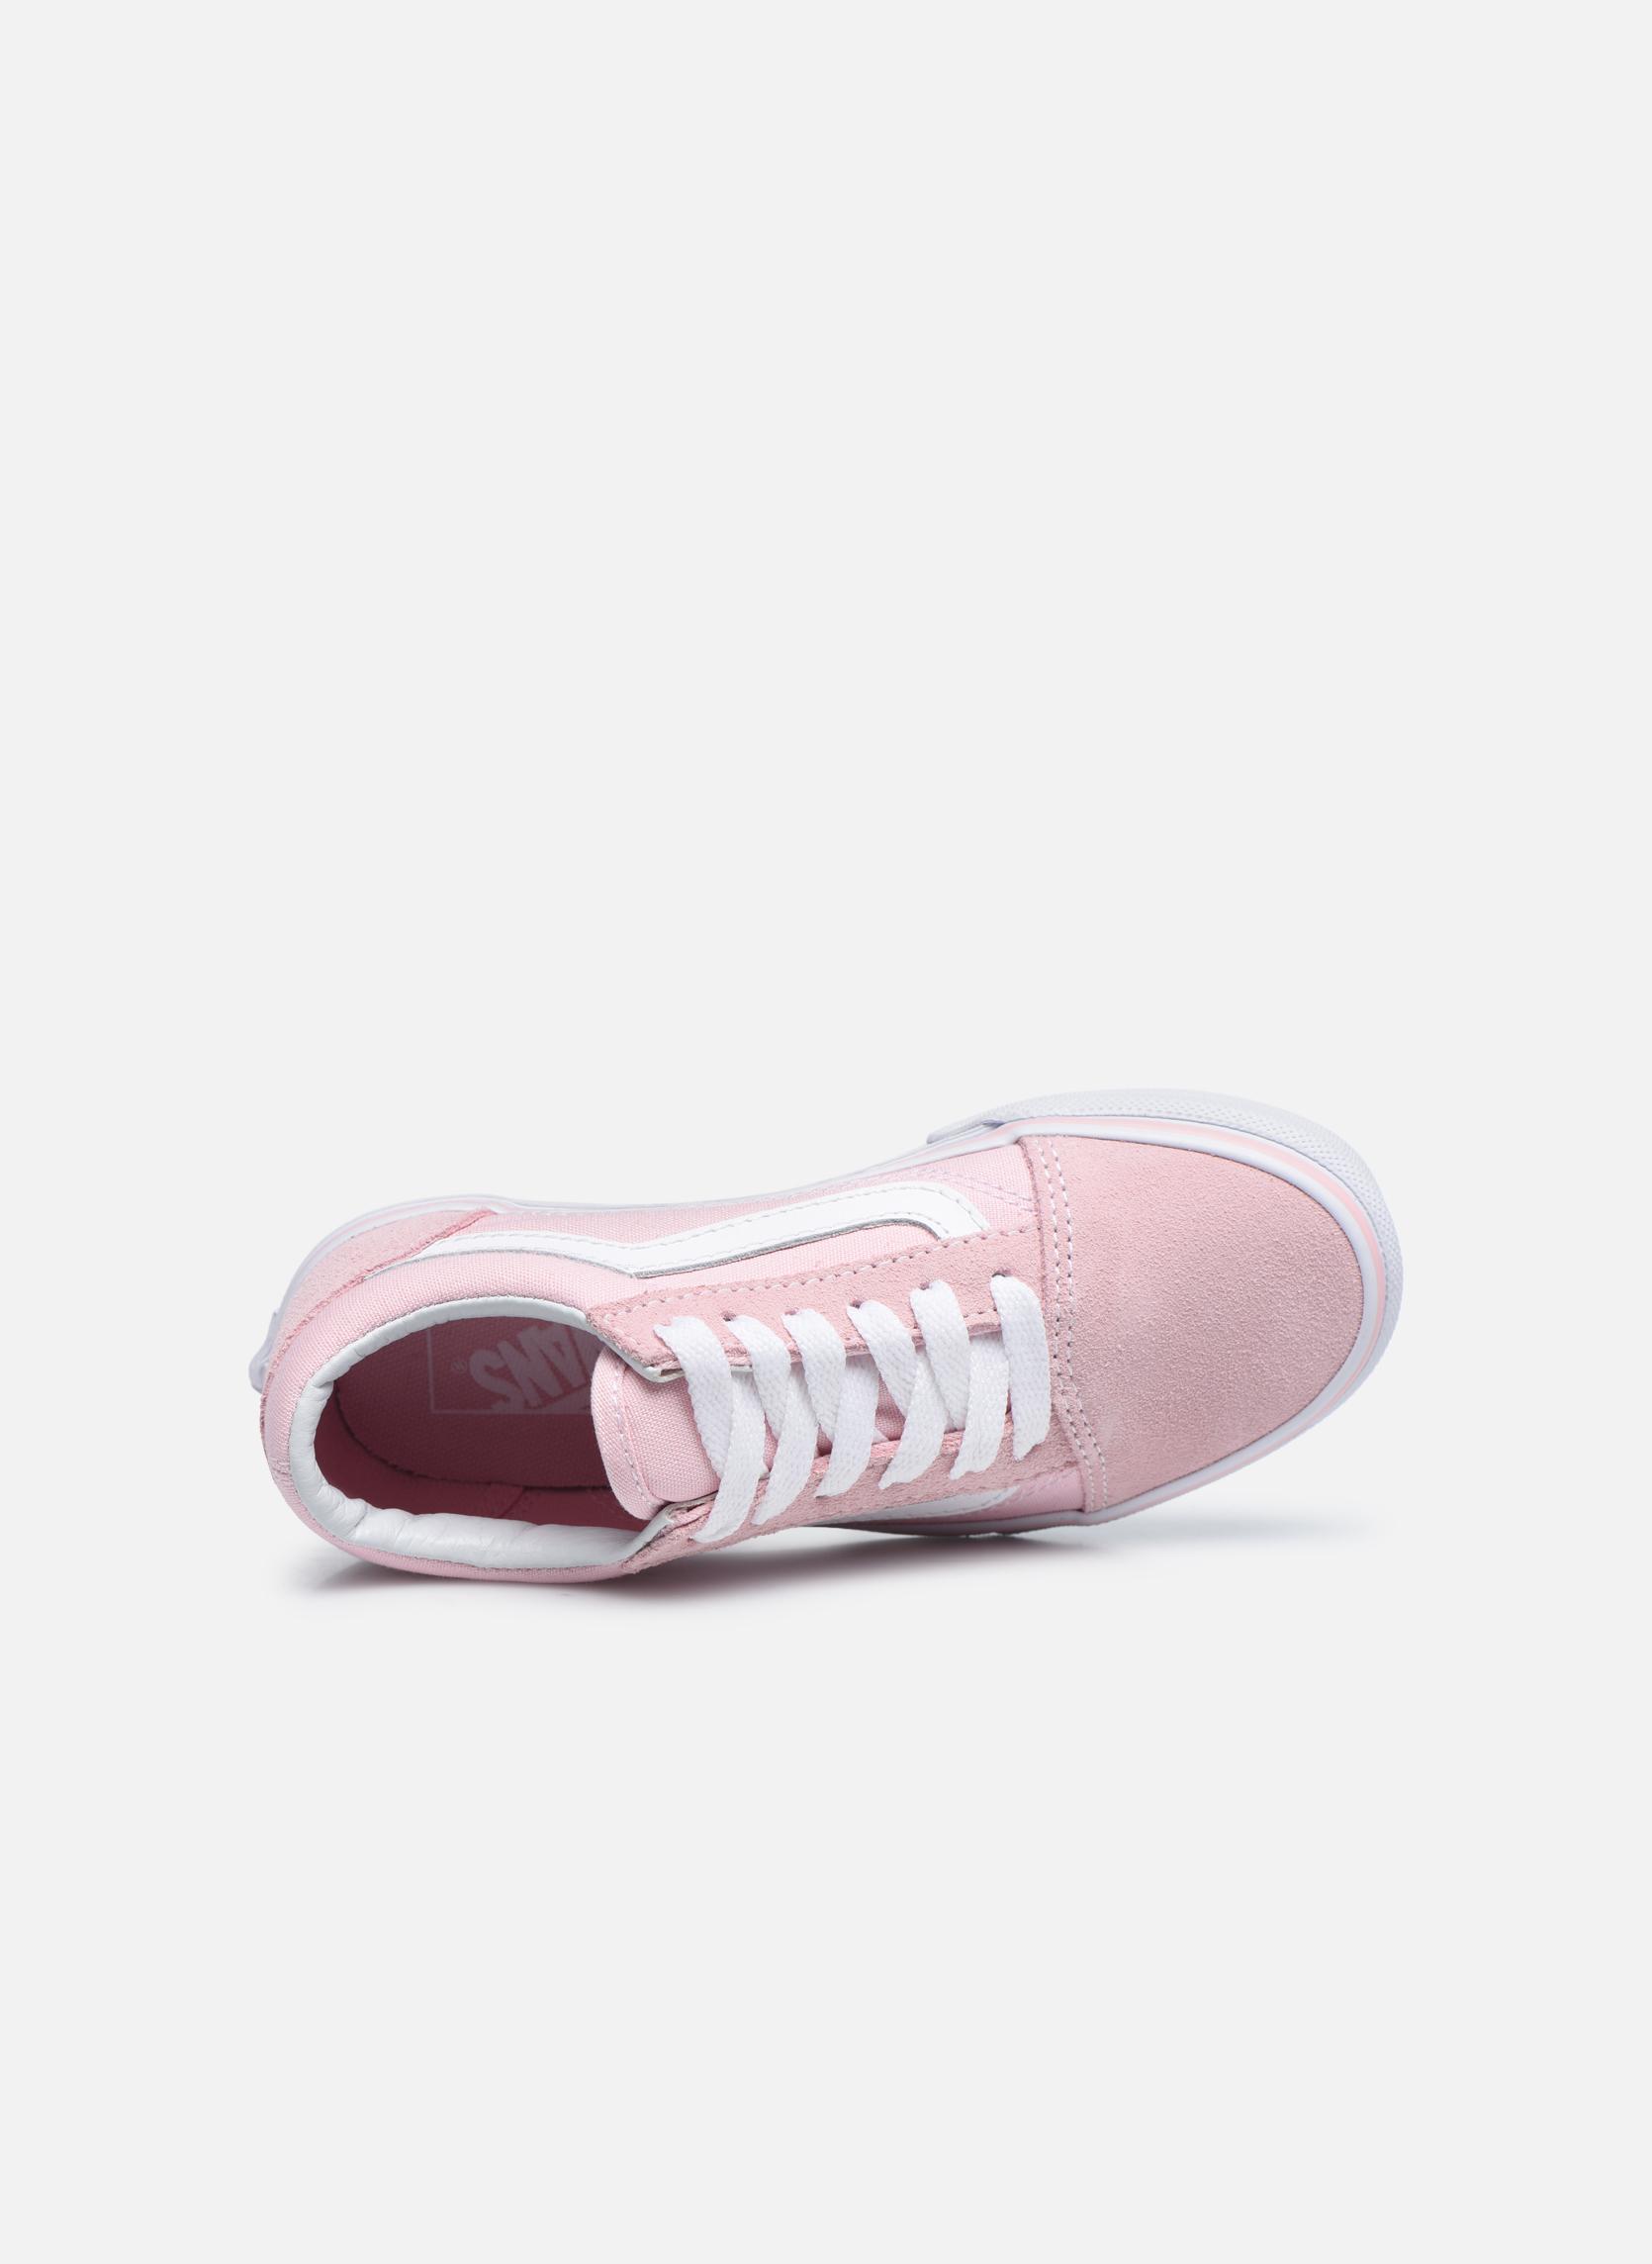 Old Skool E (Suede/Canvas) Chalk Pink/True White